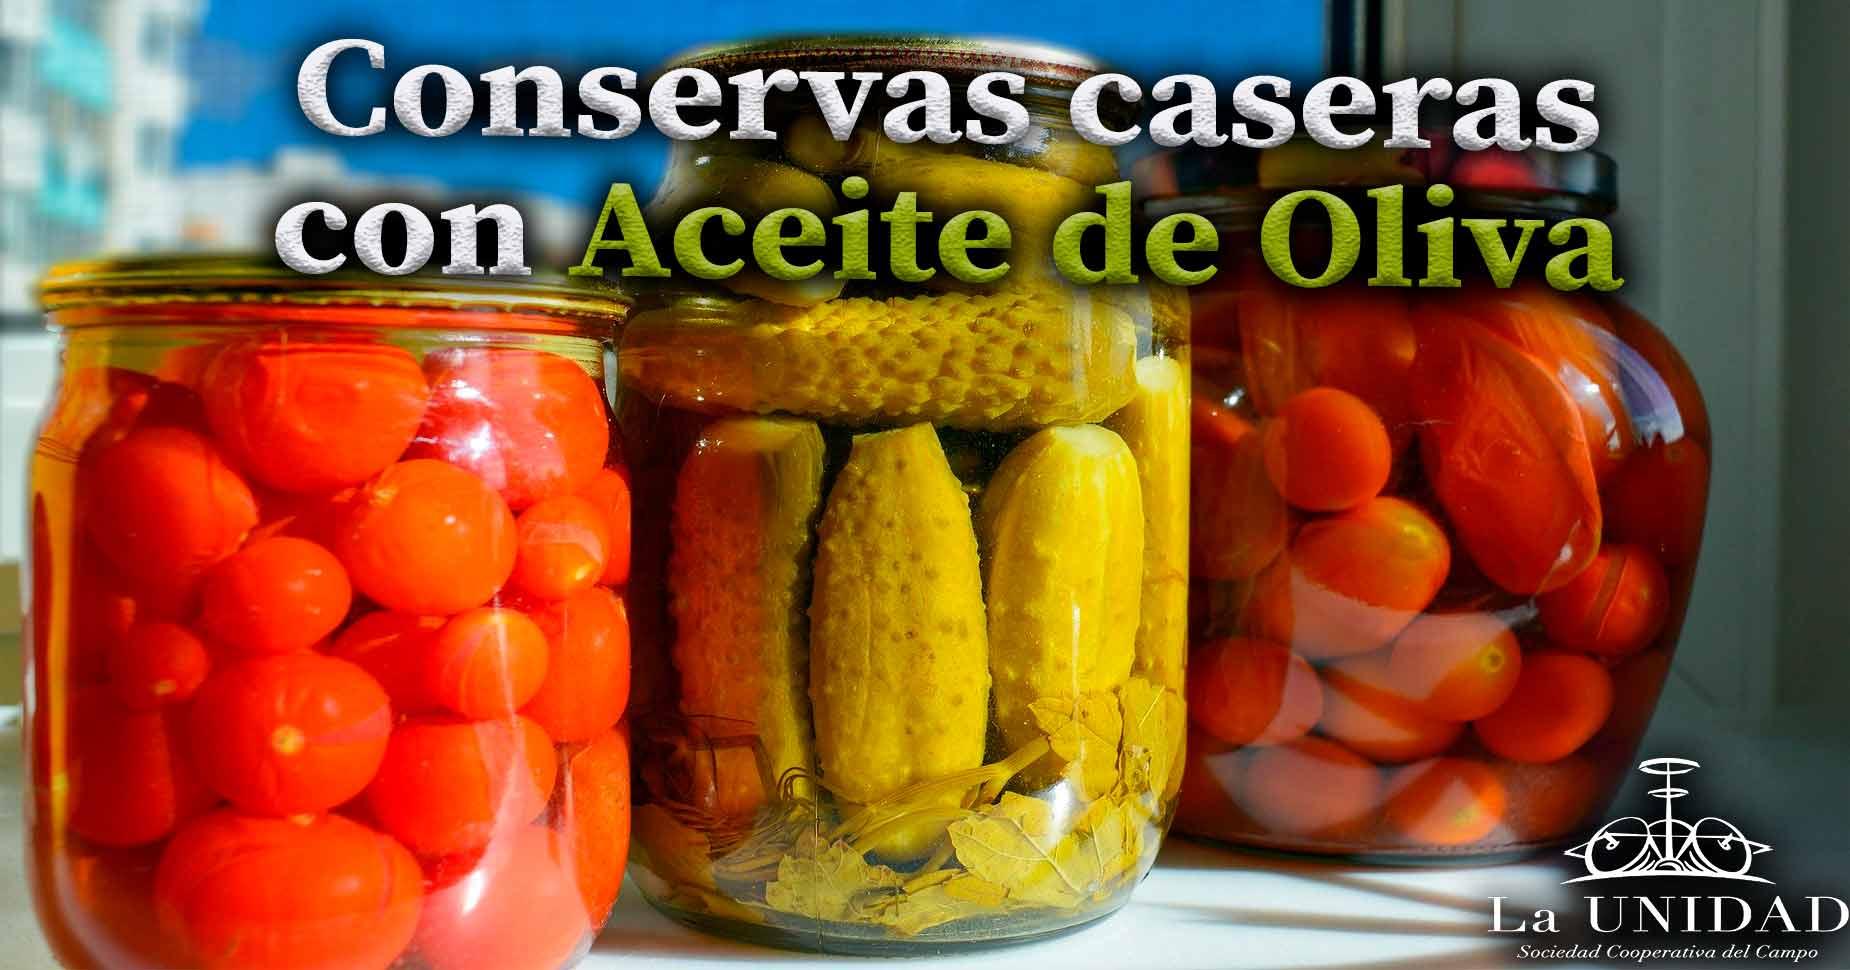 conservas caseras con aceite de oliva